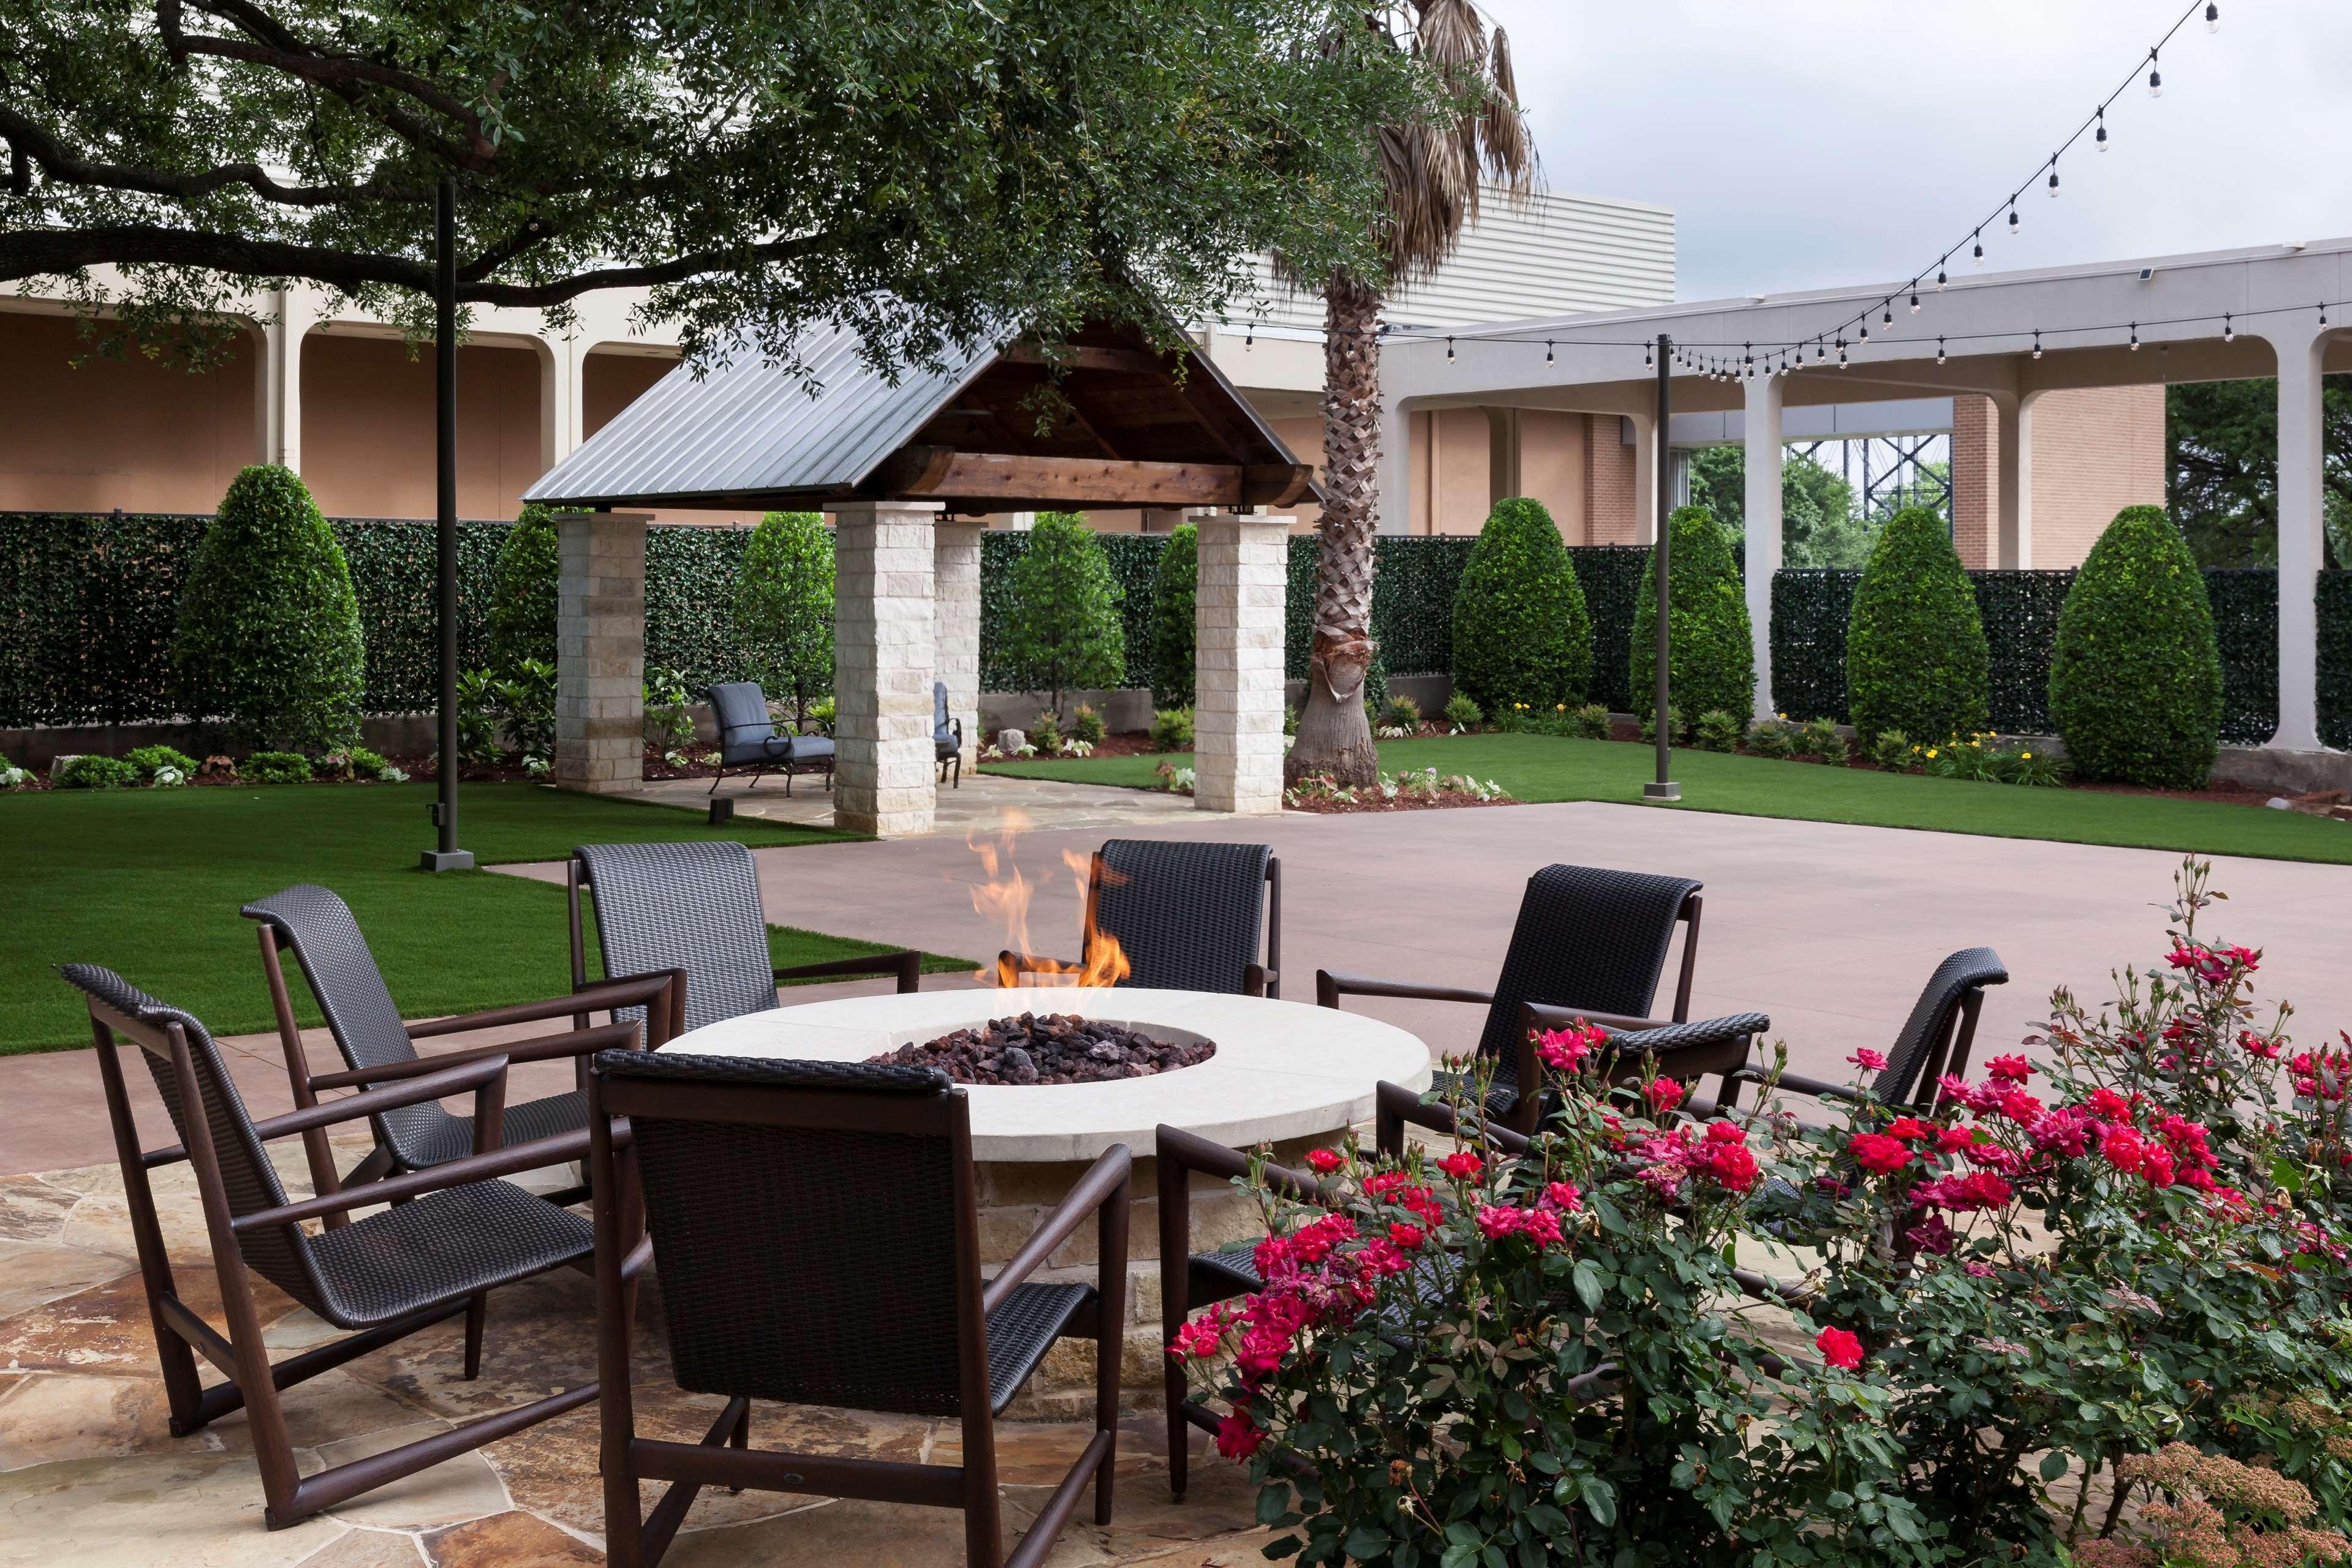 Hilton Waco image 3